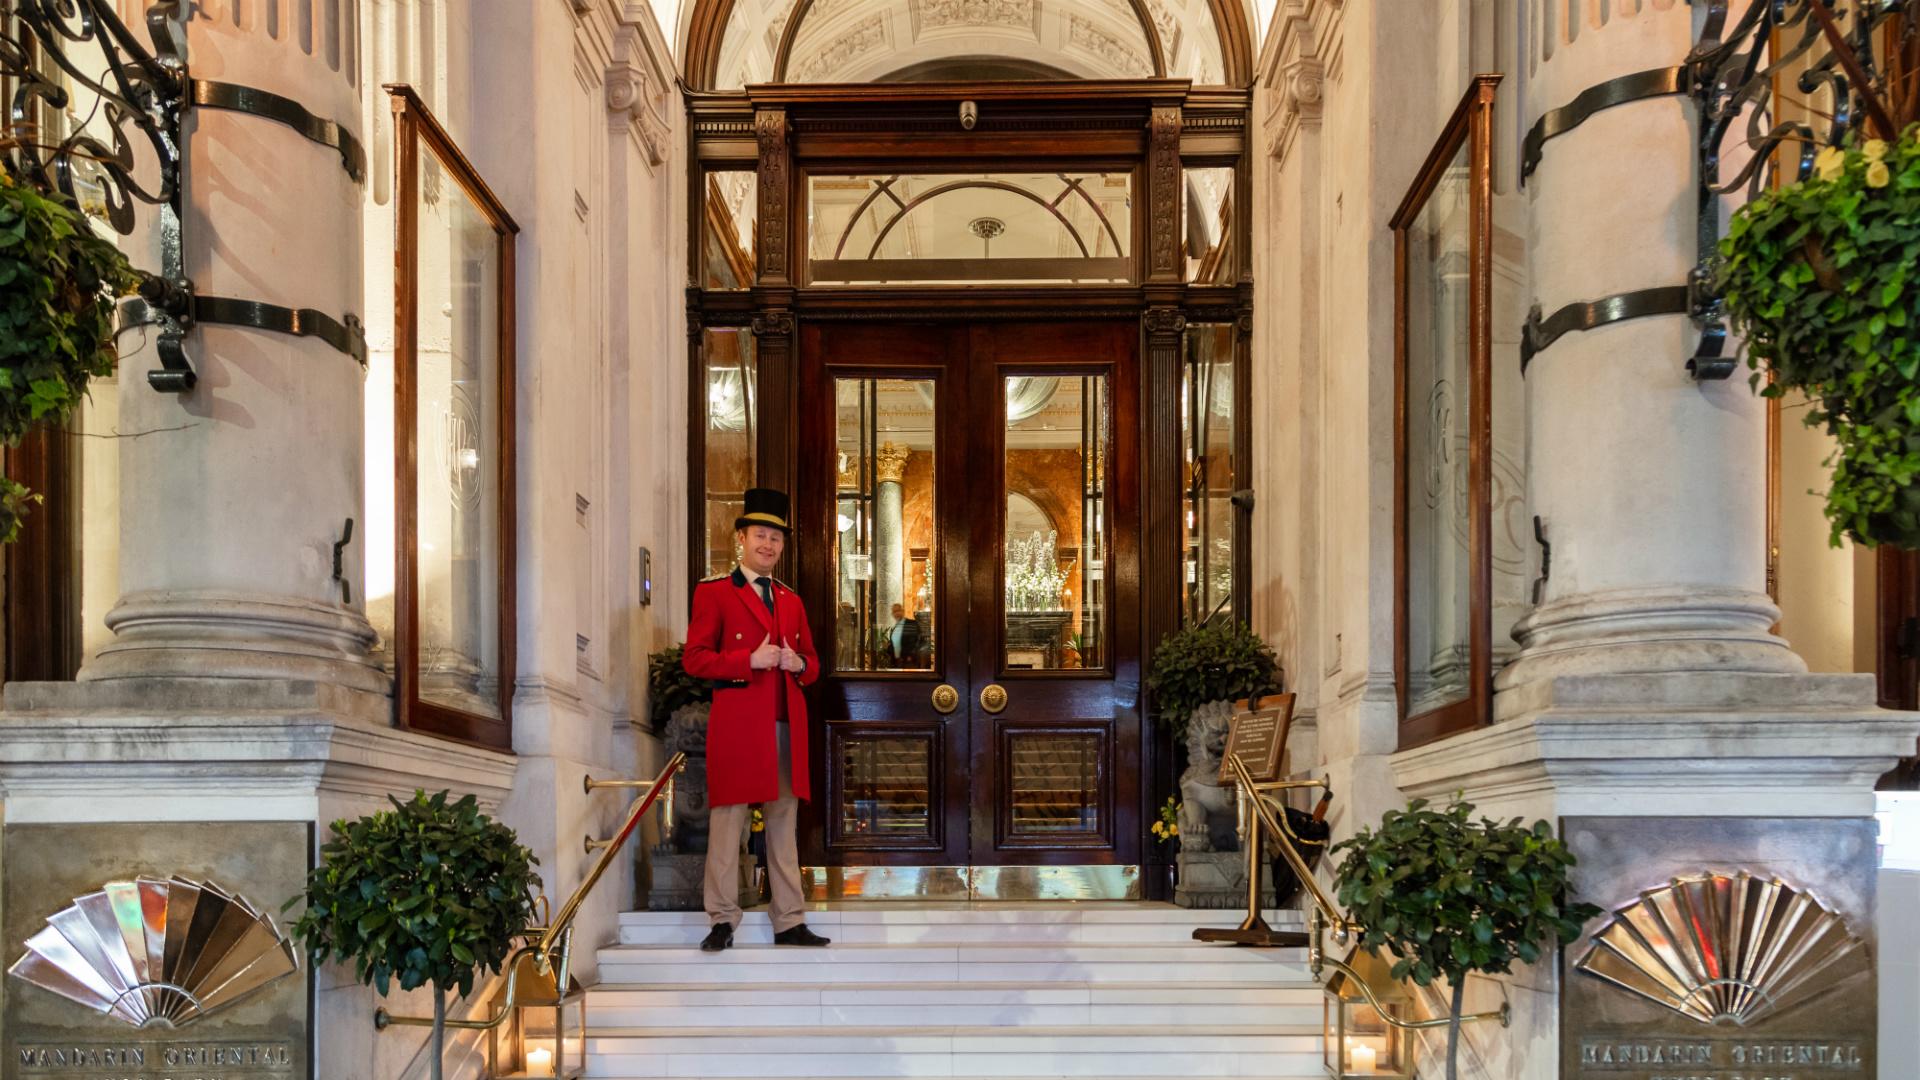 Mandarin Oriental Hotel Knightsbridge entrance and footman